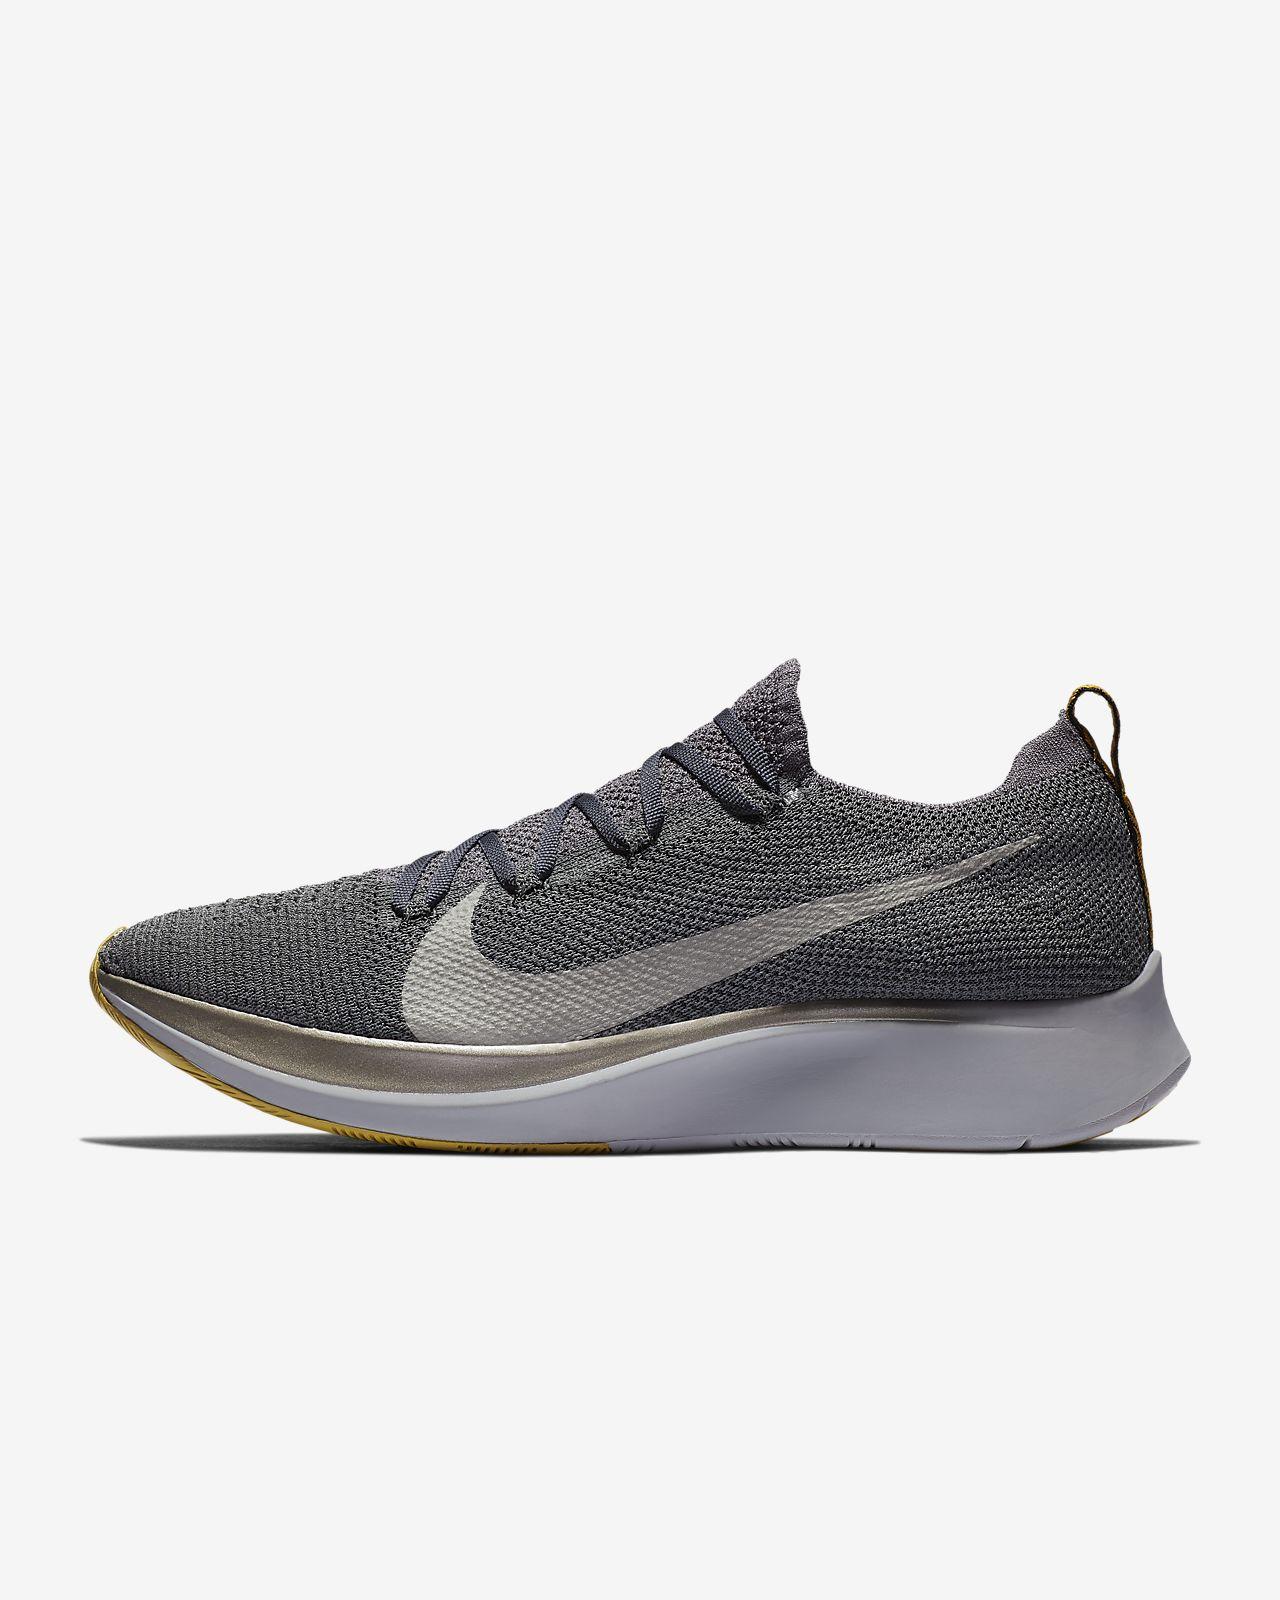 8aece23d612 Nike Zoom Fly Flyknit Zapatillas de running - Hombre. Nike.com ES